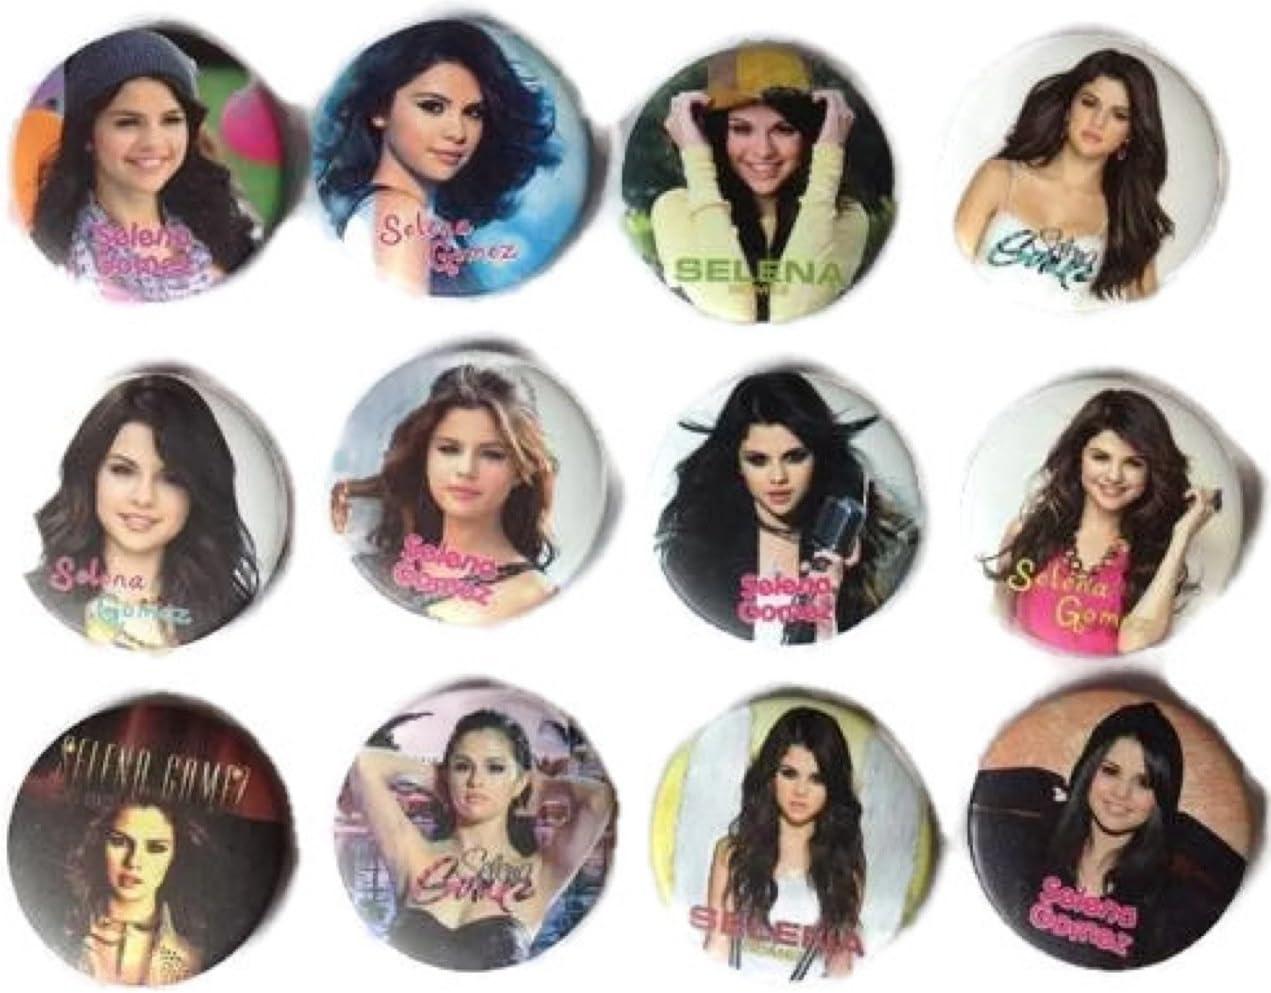 The Bigger Vivider 1.75 Lot 12 Awesome Pin Button Badge Selena Gomez album brooch